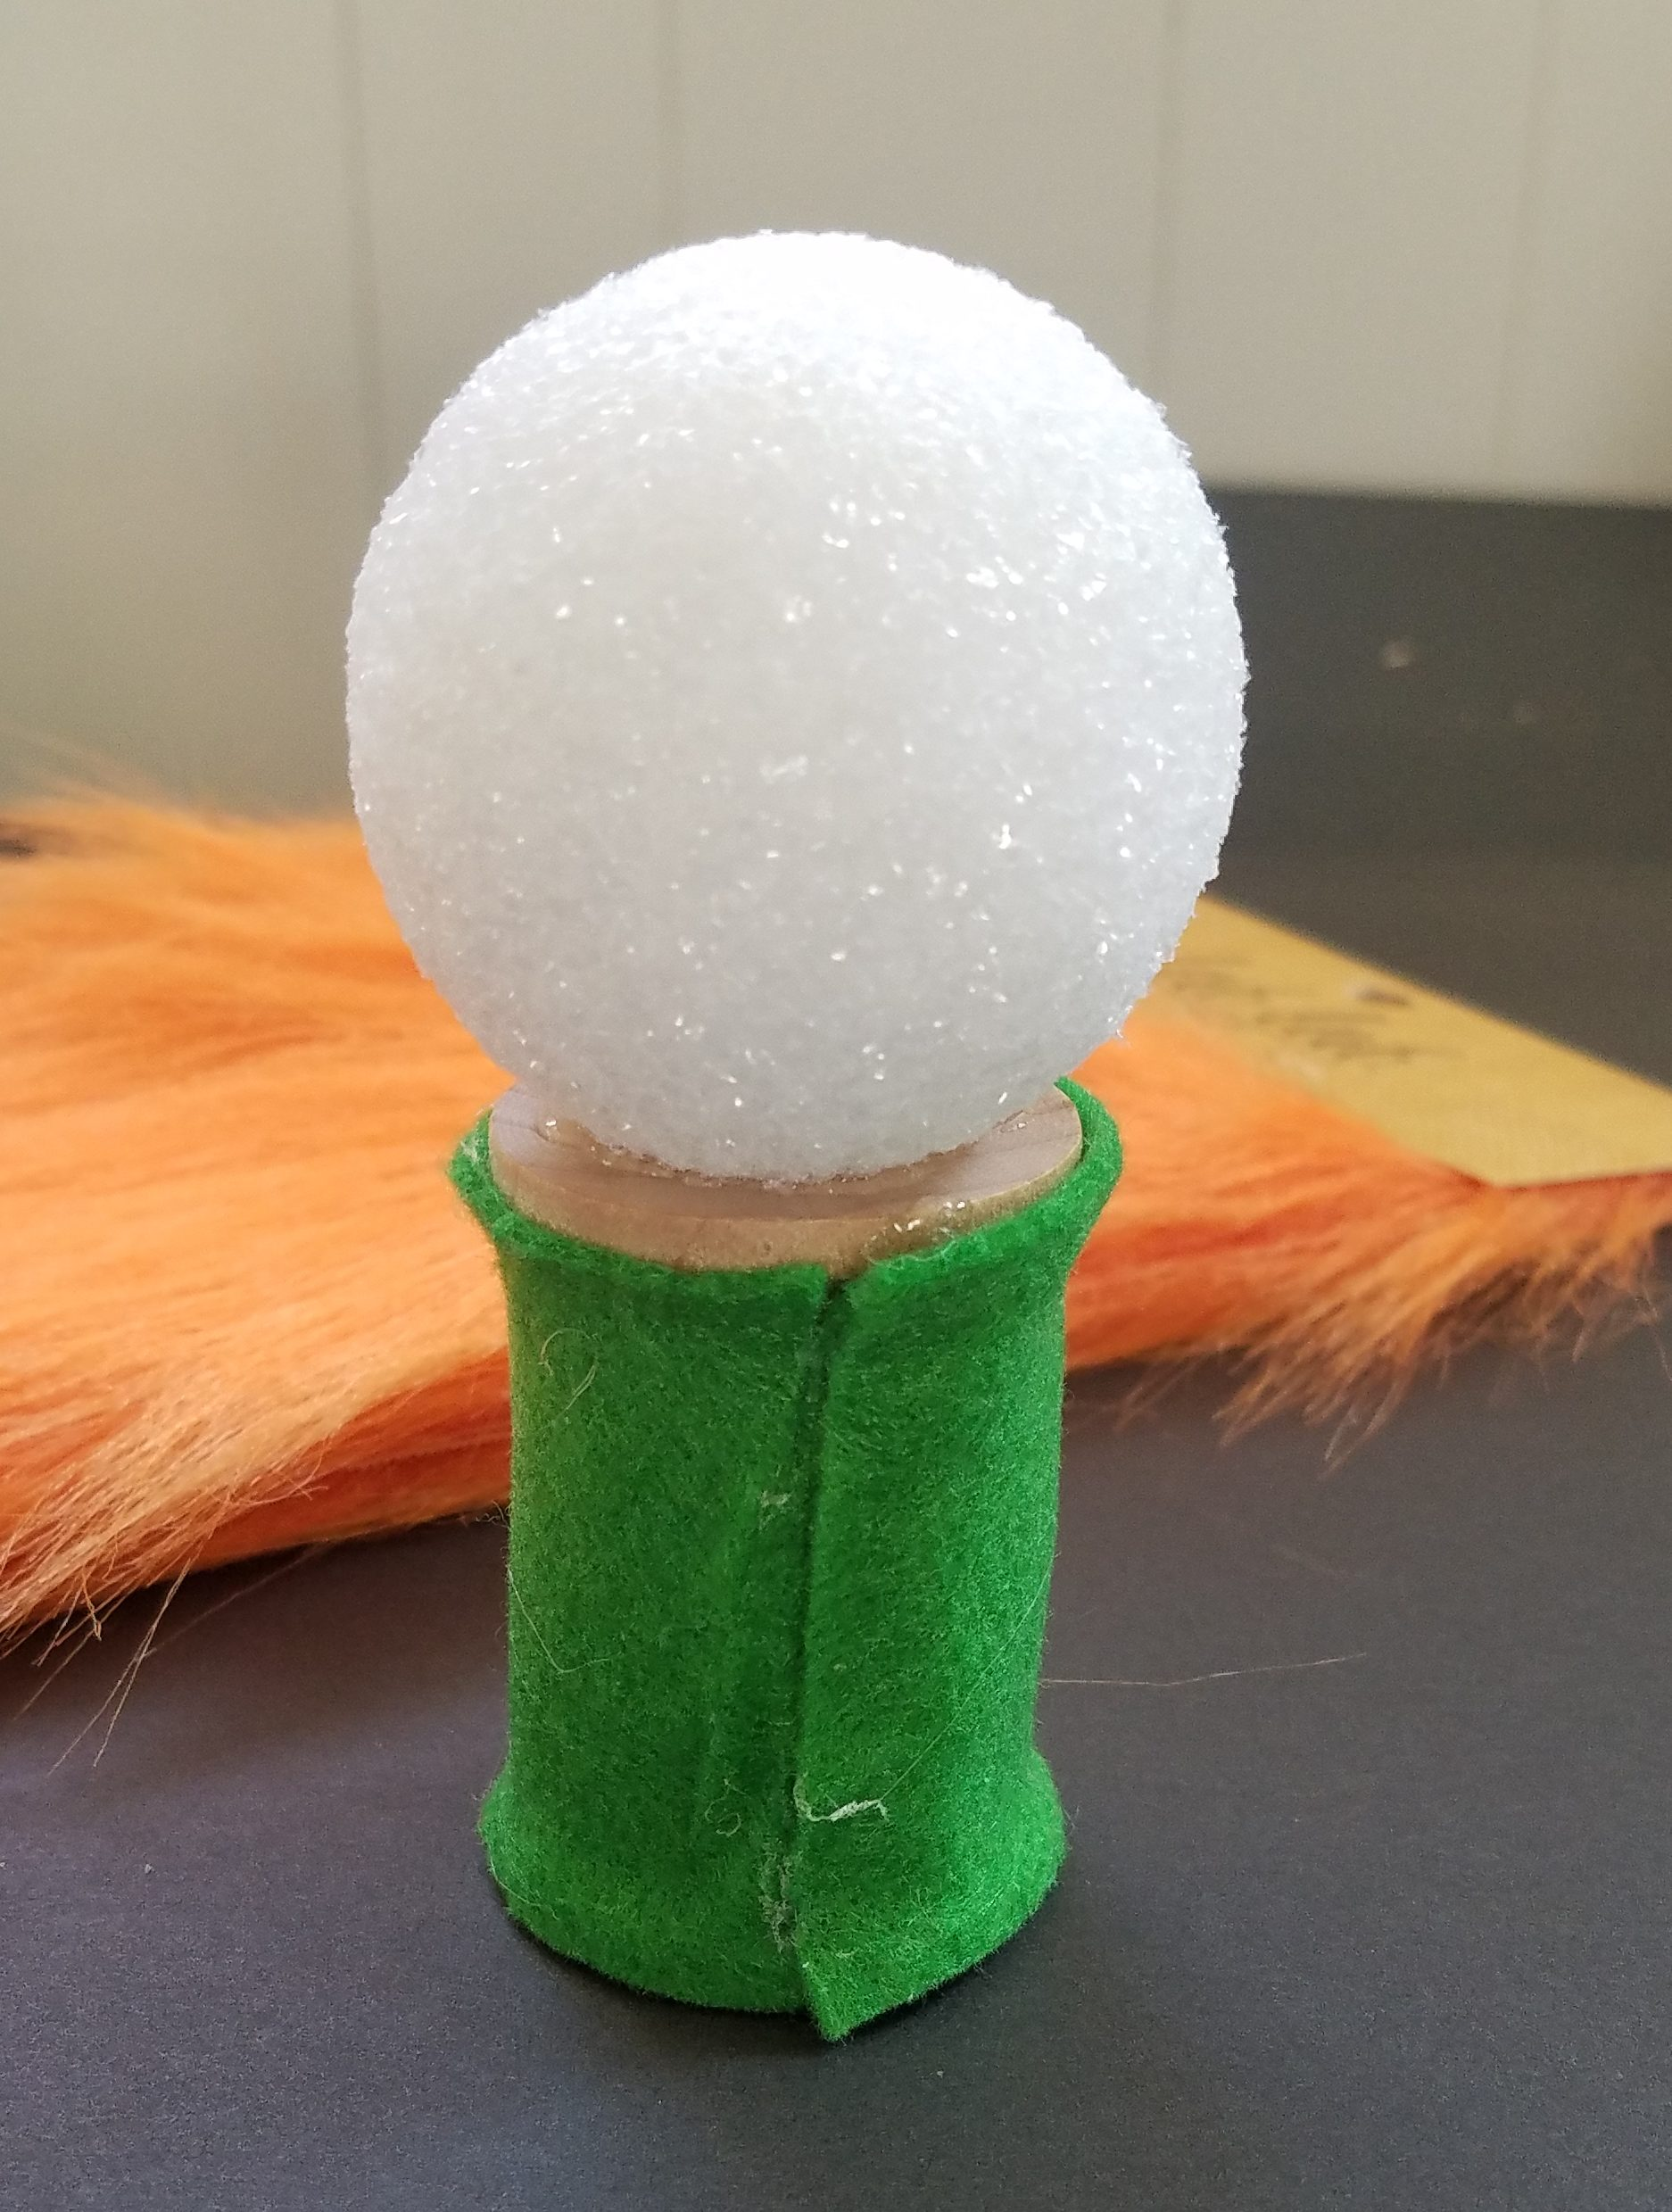 Easy DIY Gnome using styrofoam ball and thread spool